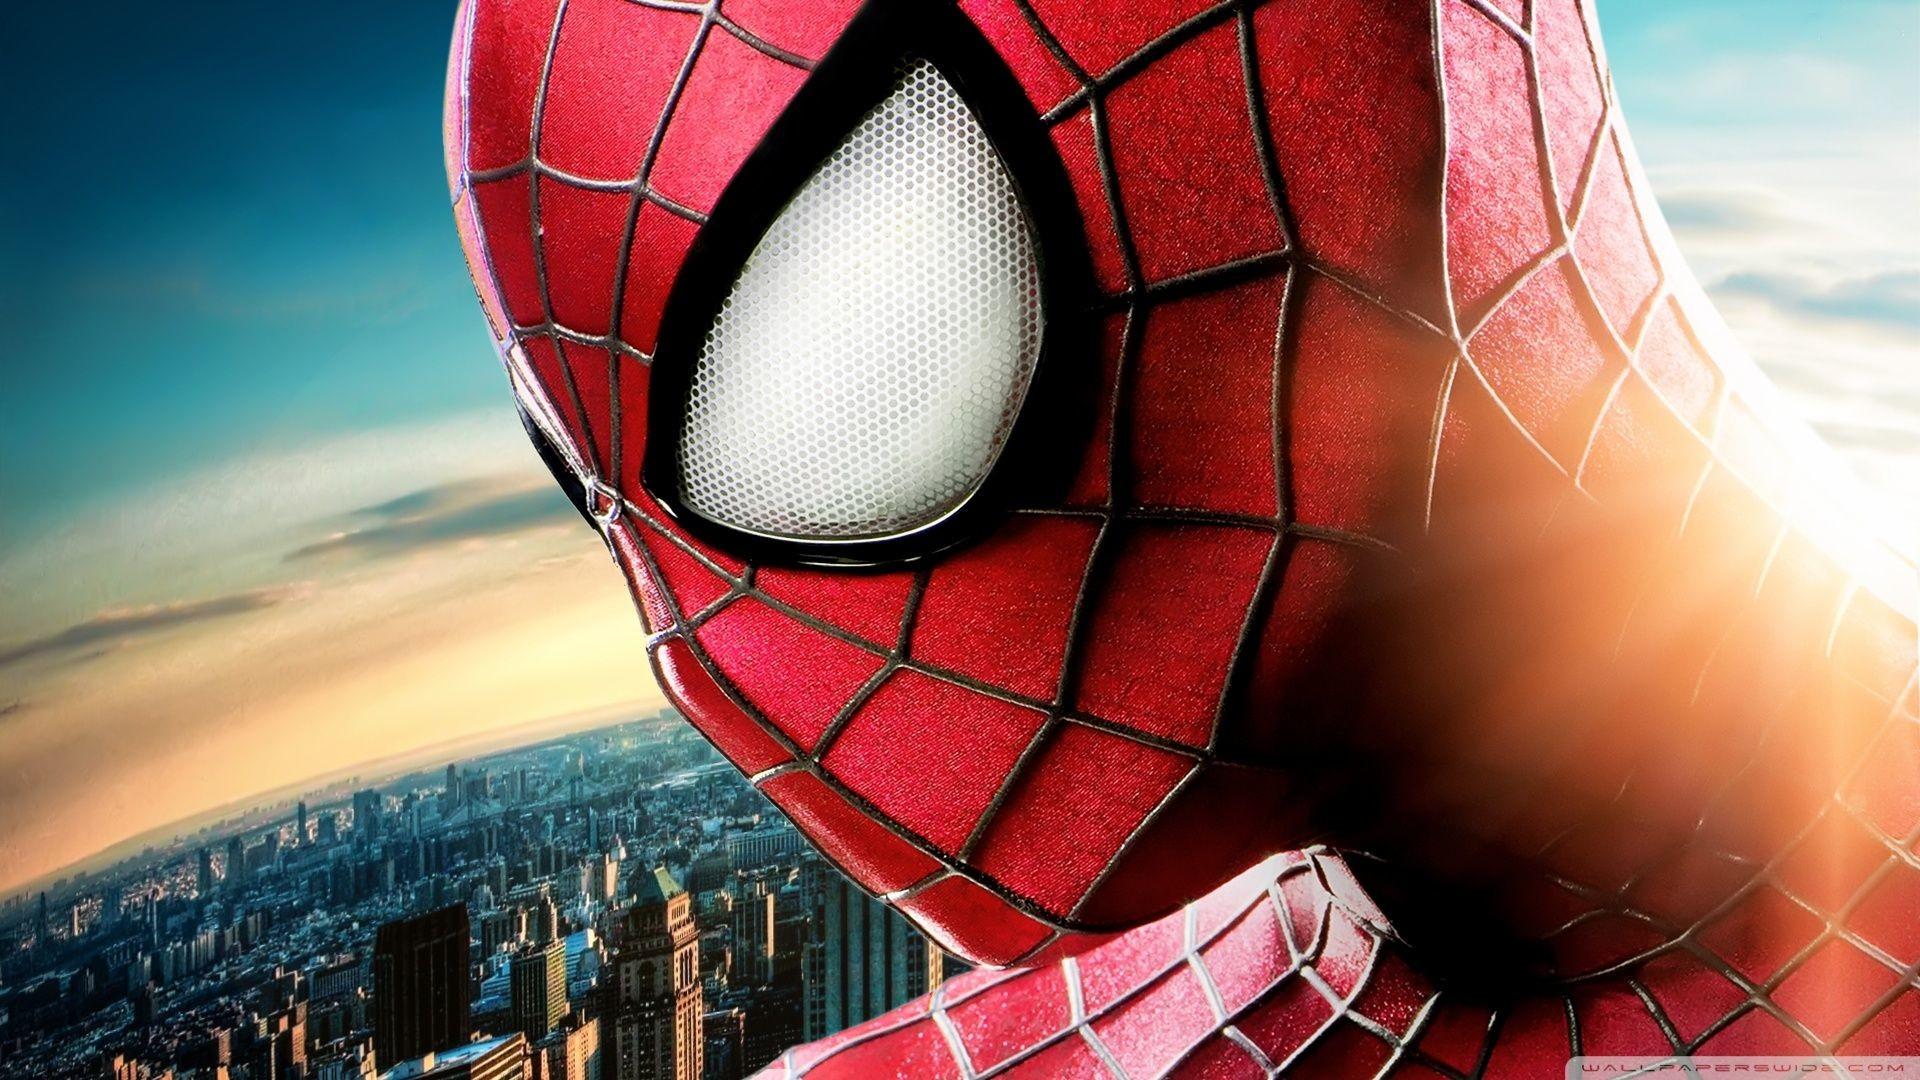 Spiderman HD Wallpaper 1920x1080 (81+ images)